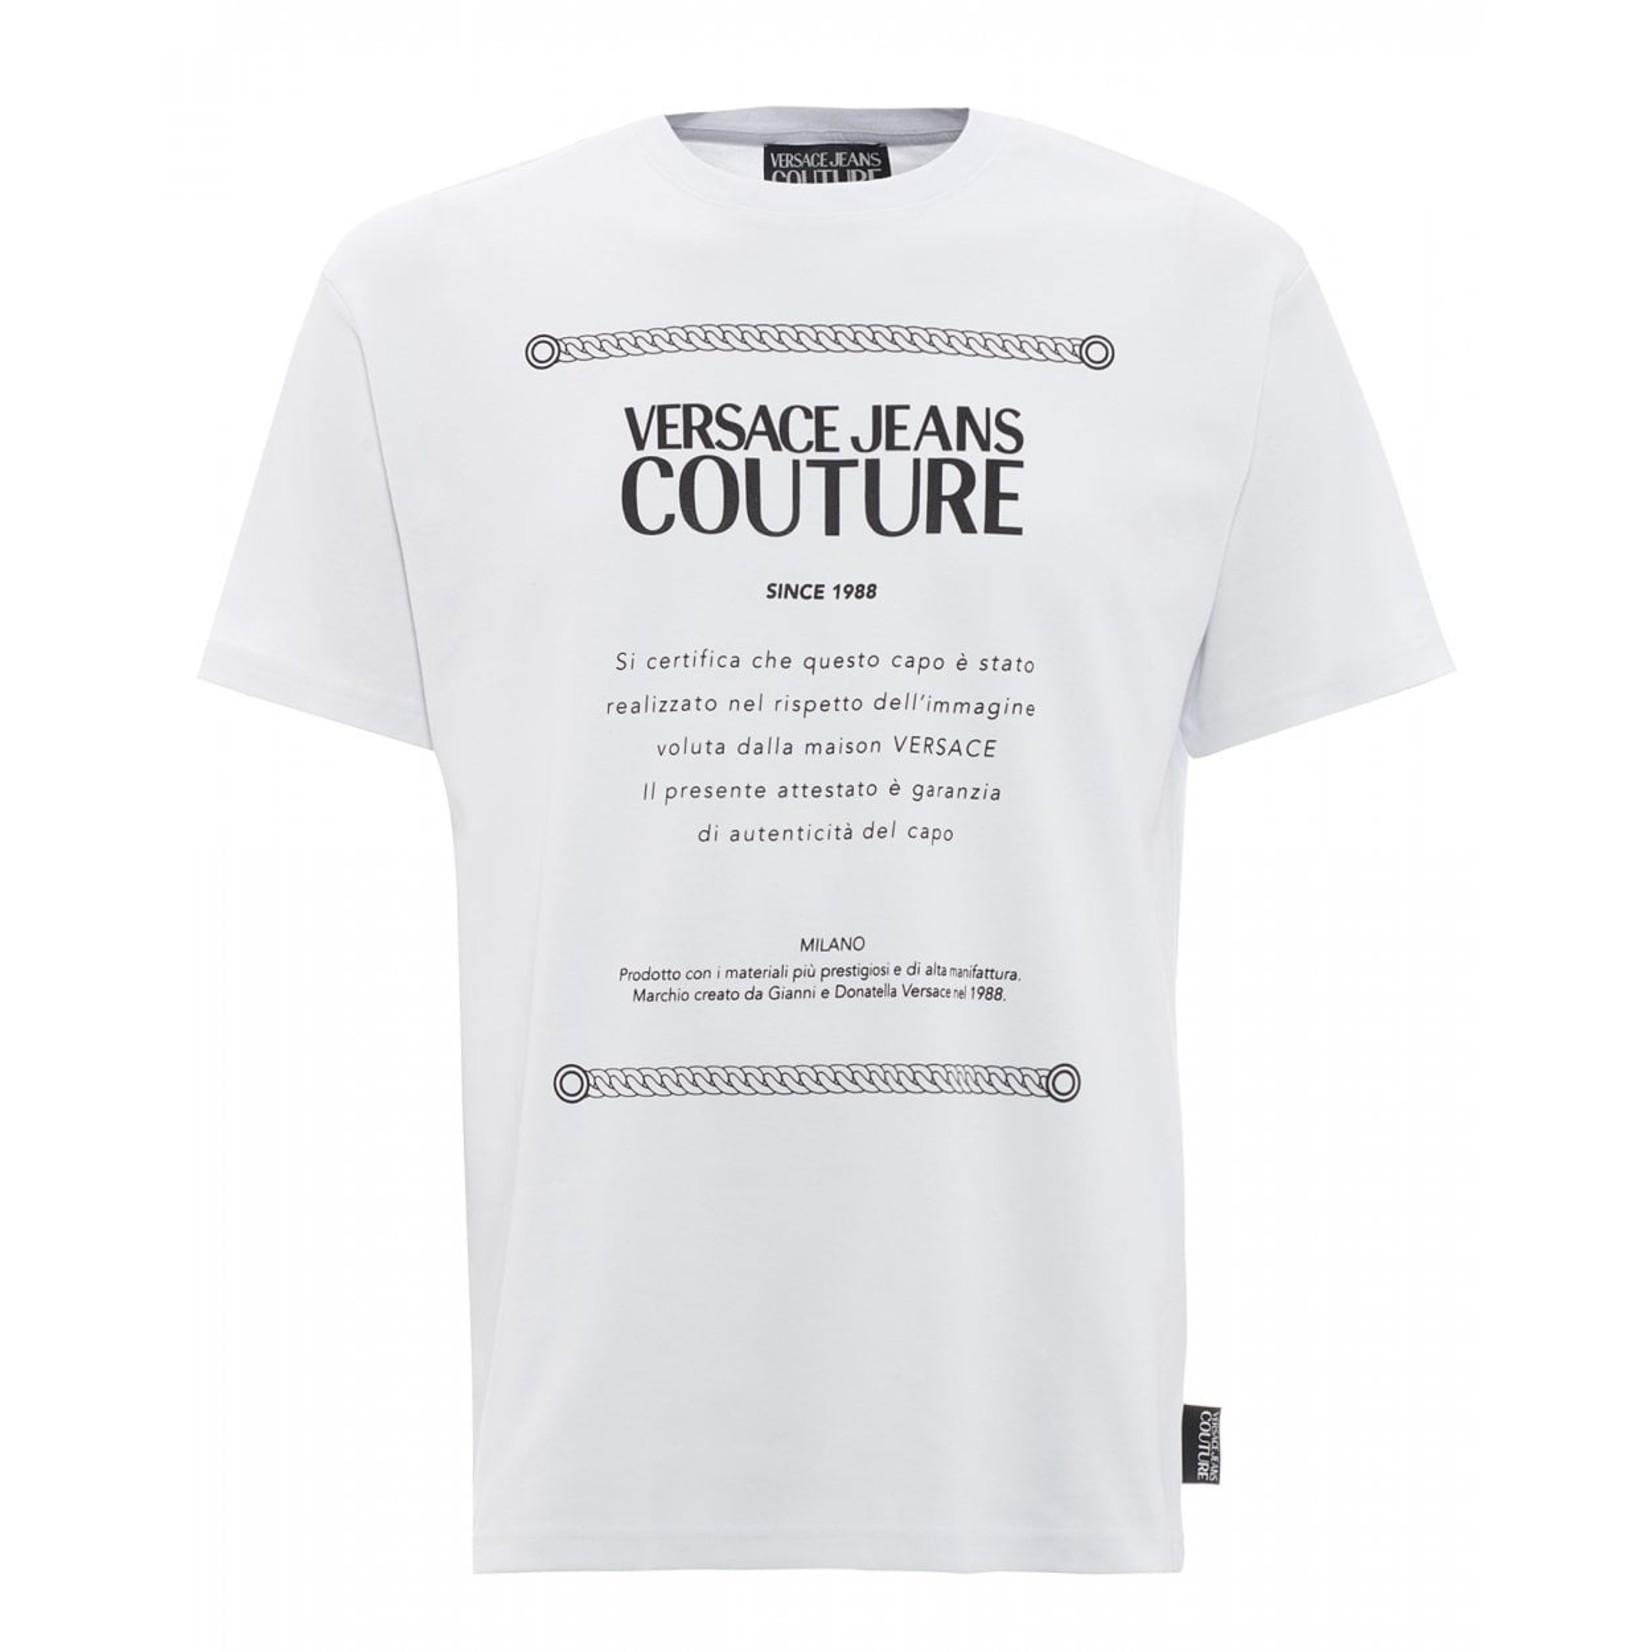 VERSACE JEANS COUTURE VERSACE JEANS COUTURE T-SHIRT  B3GVAX23 - WHITE